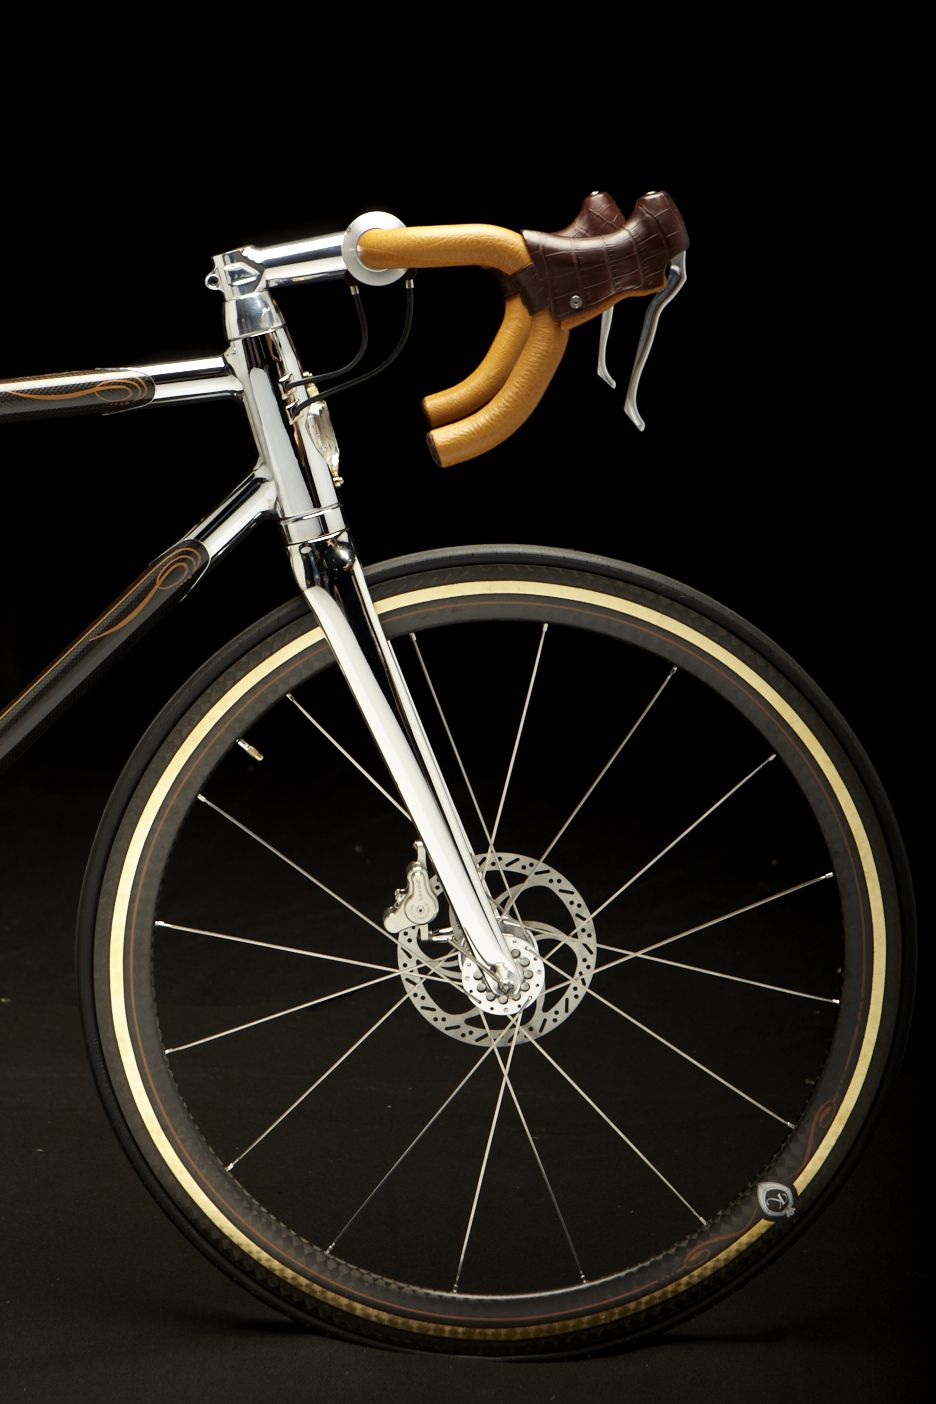 The Most Beautiful Bike Ever Krencker La Bicyclette De Luxe